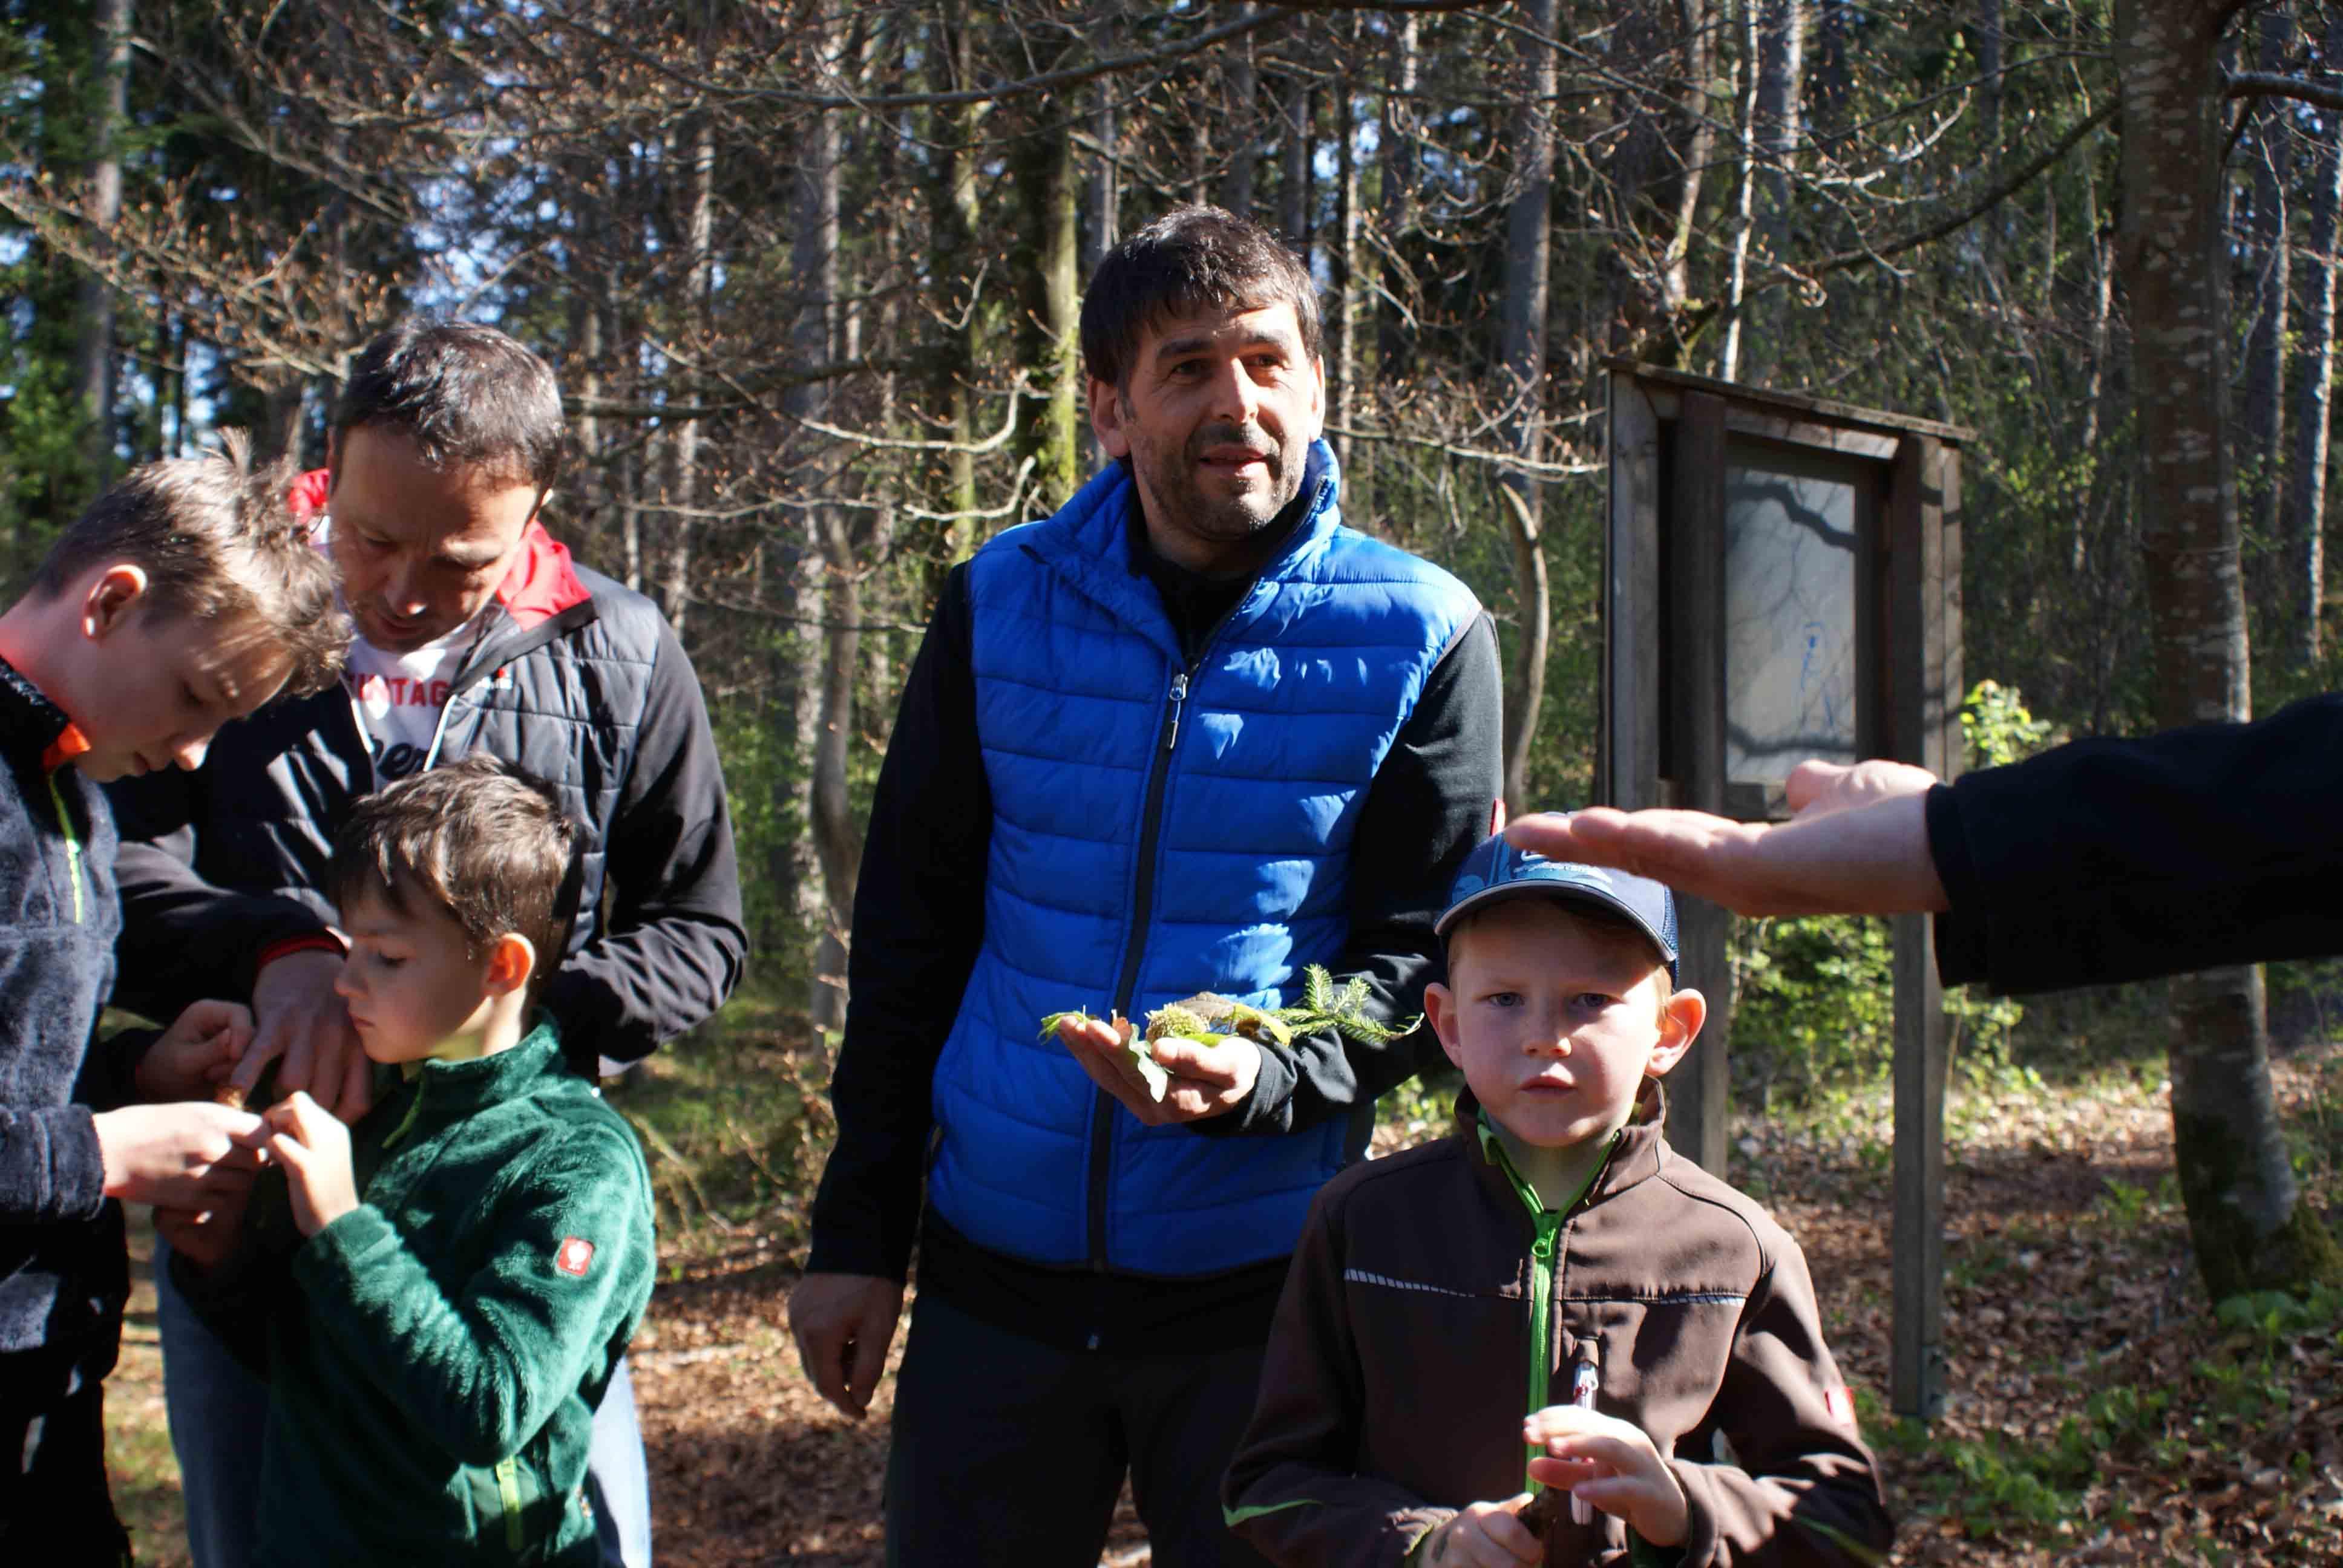 Nenzing: Vater-Kind-Abenteuer im Wald